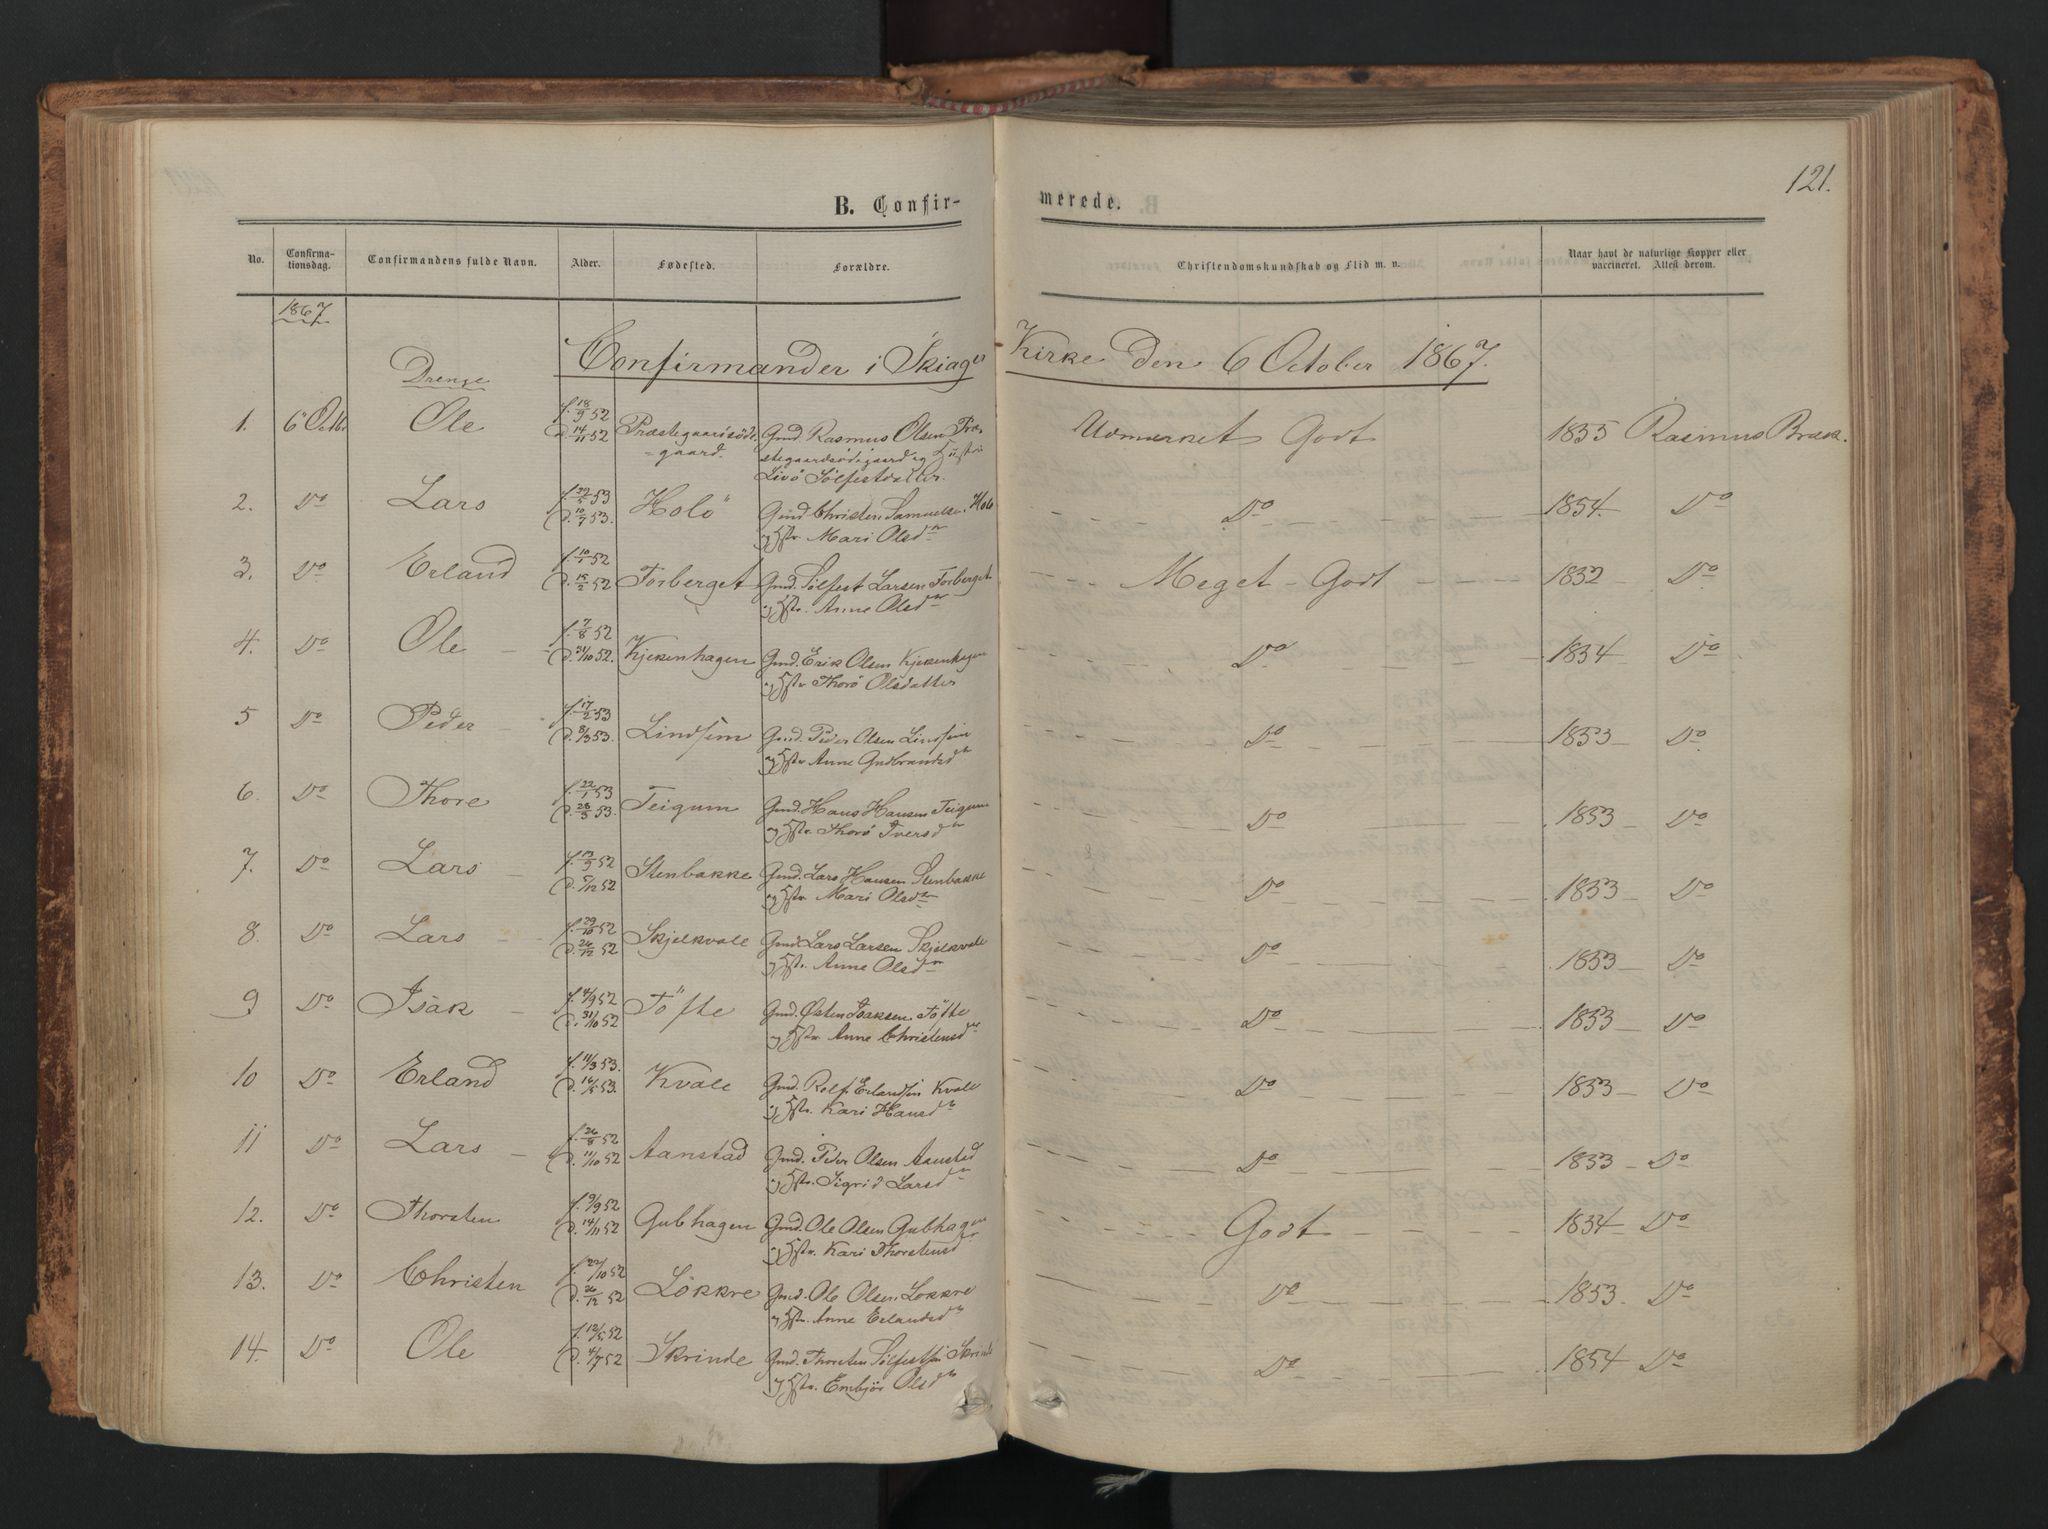 SAH, Skjåk prestekontor, Ministerialbok nr. 1, 1863-1879, s. 121